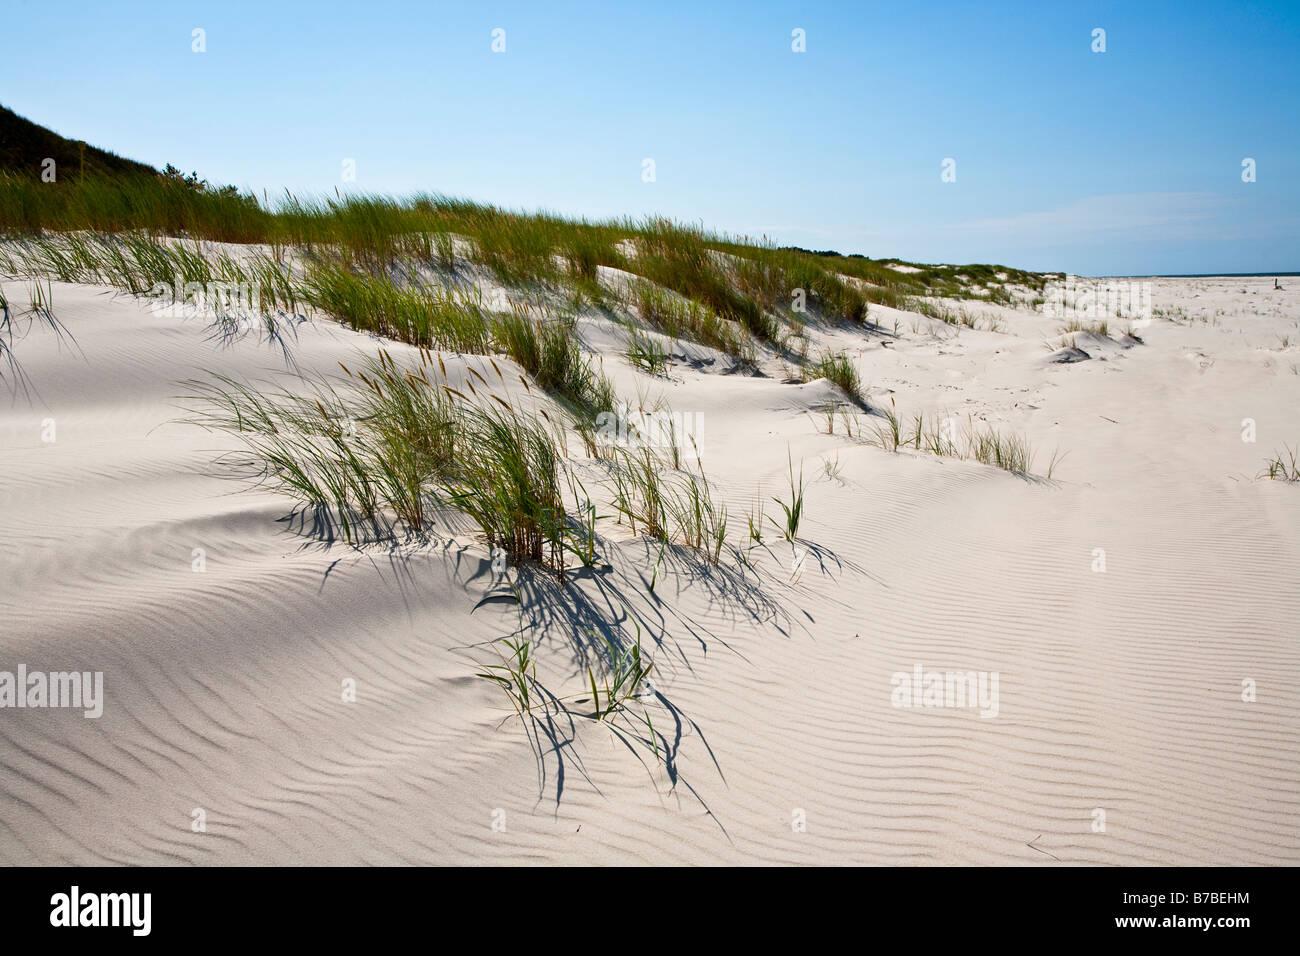 Marram grass Ammophilia arenaria in young sand dunes Slowinski national park Baltic sea Poland - Stock Image